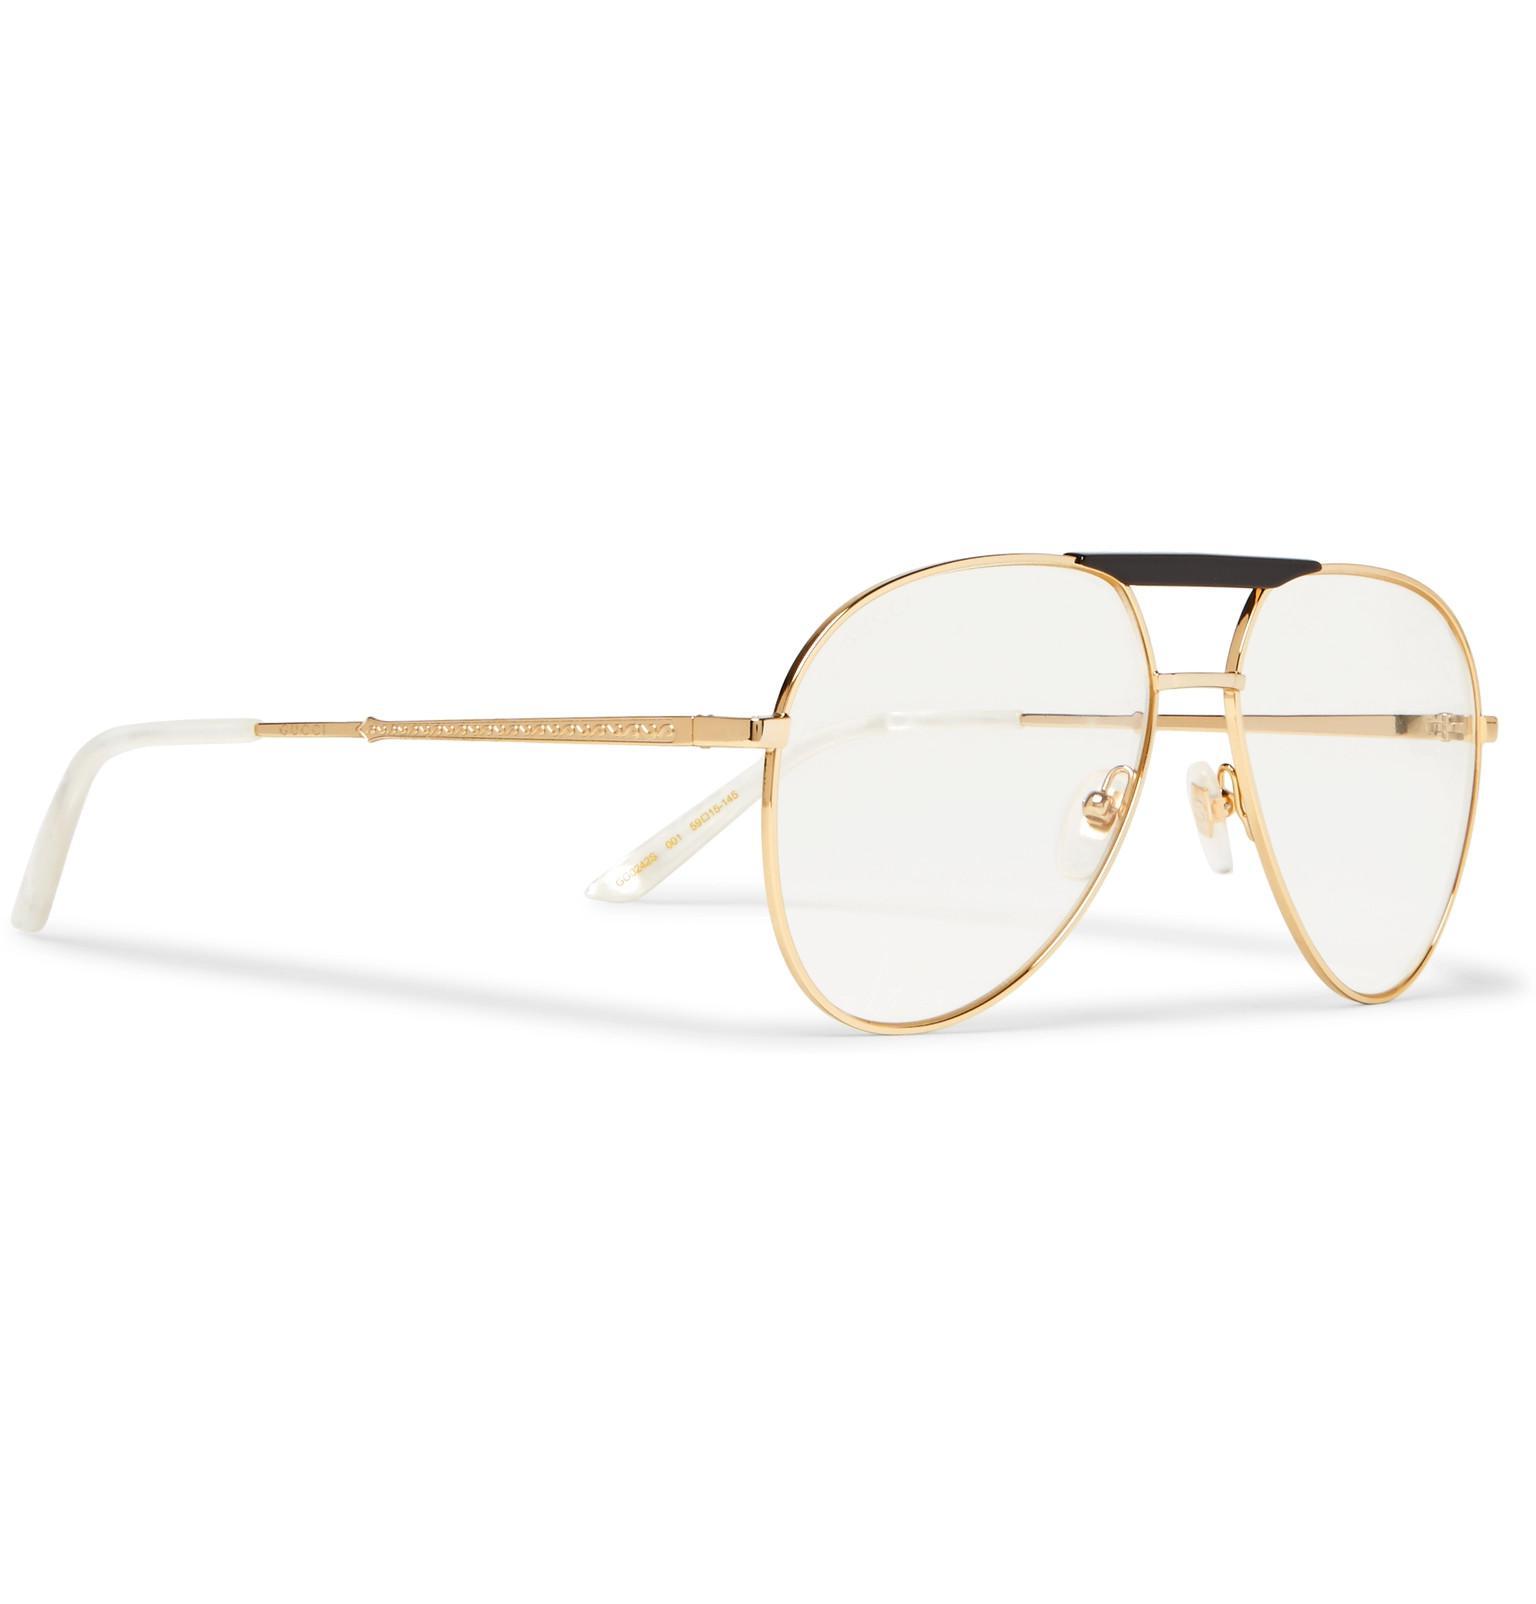 57b567296173 Gucci Endura Aviator-style Acetate And Gold-tone Optical Glasses in ...